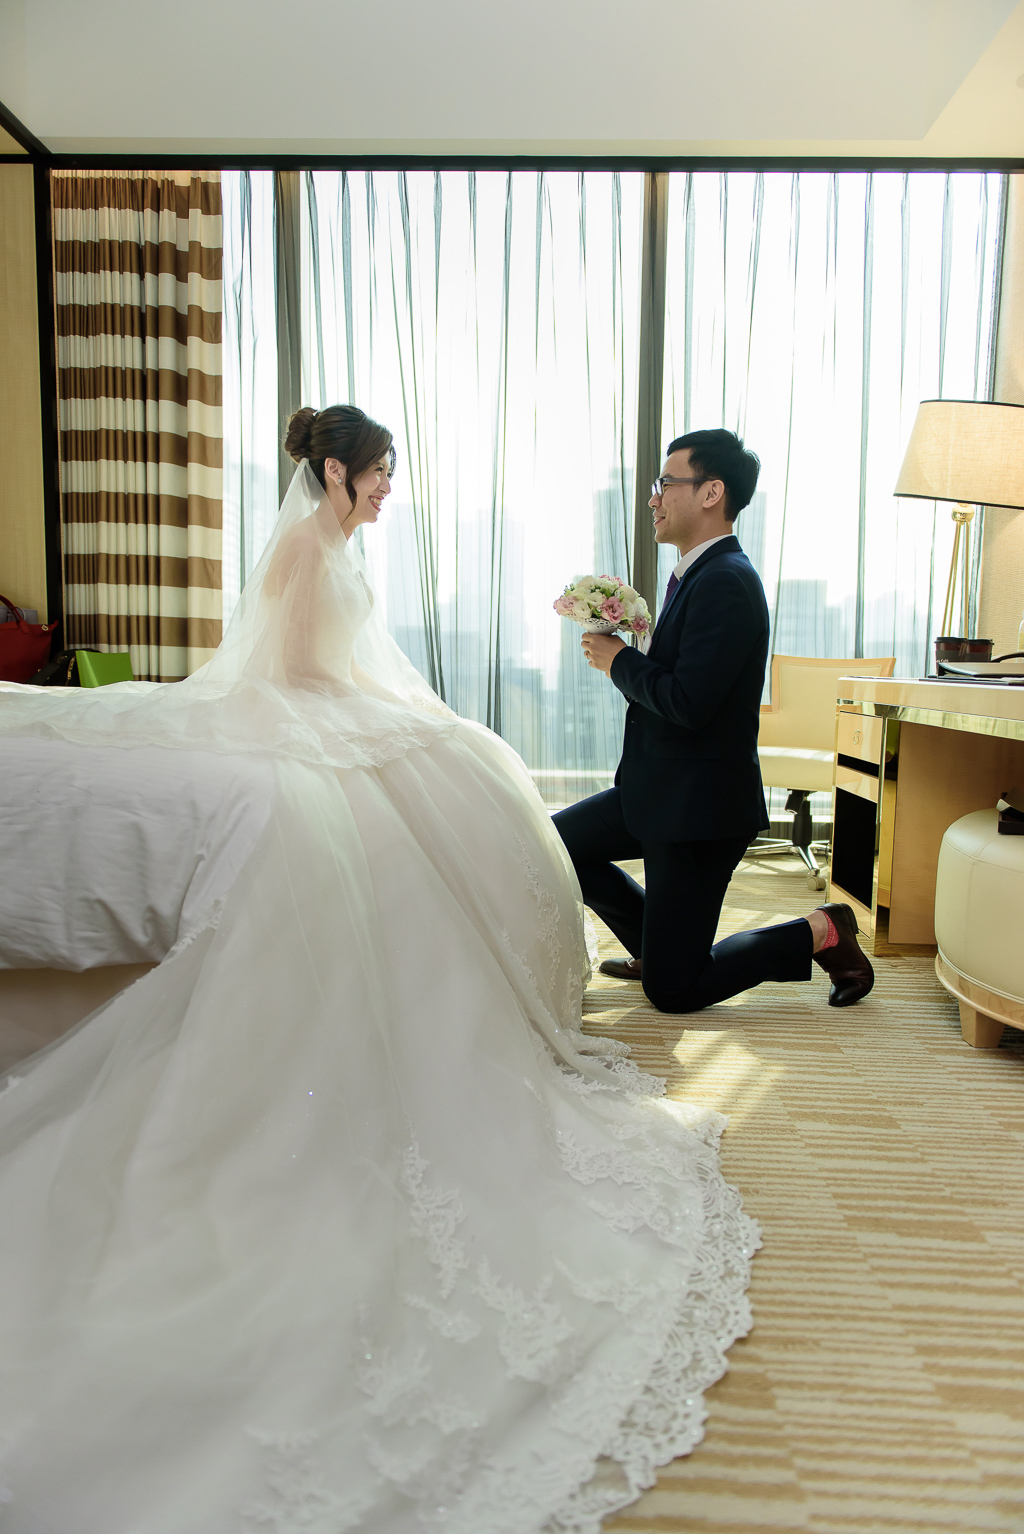 Wedding day-0045 ,僑園婚攝,台中僑園,僑園婚宴,新秘Alice ,婚攝小勇,台北婚攝, 小淑造型團隊